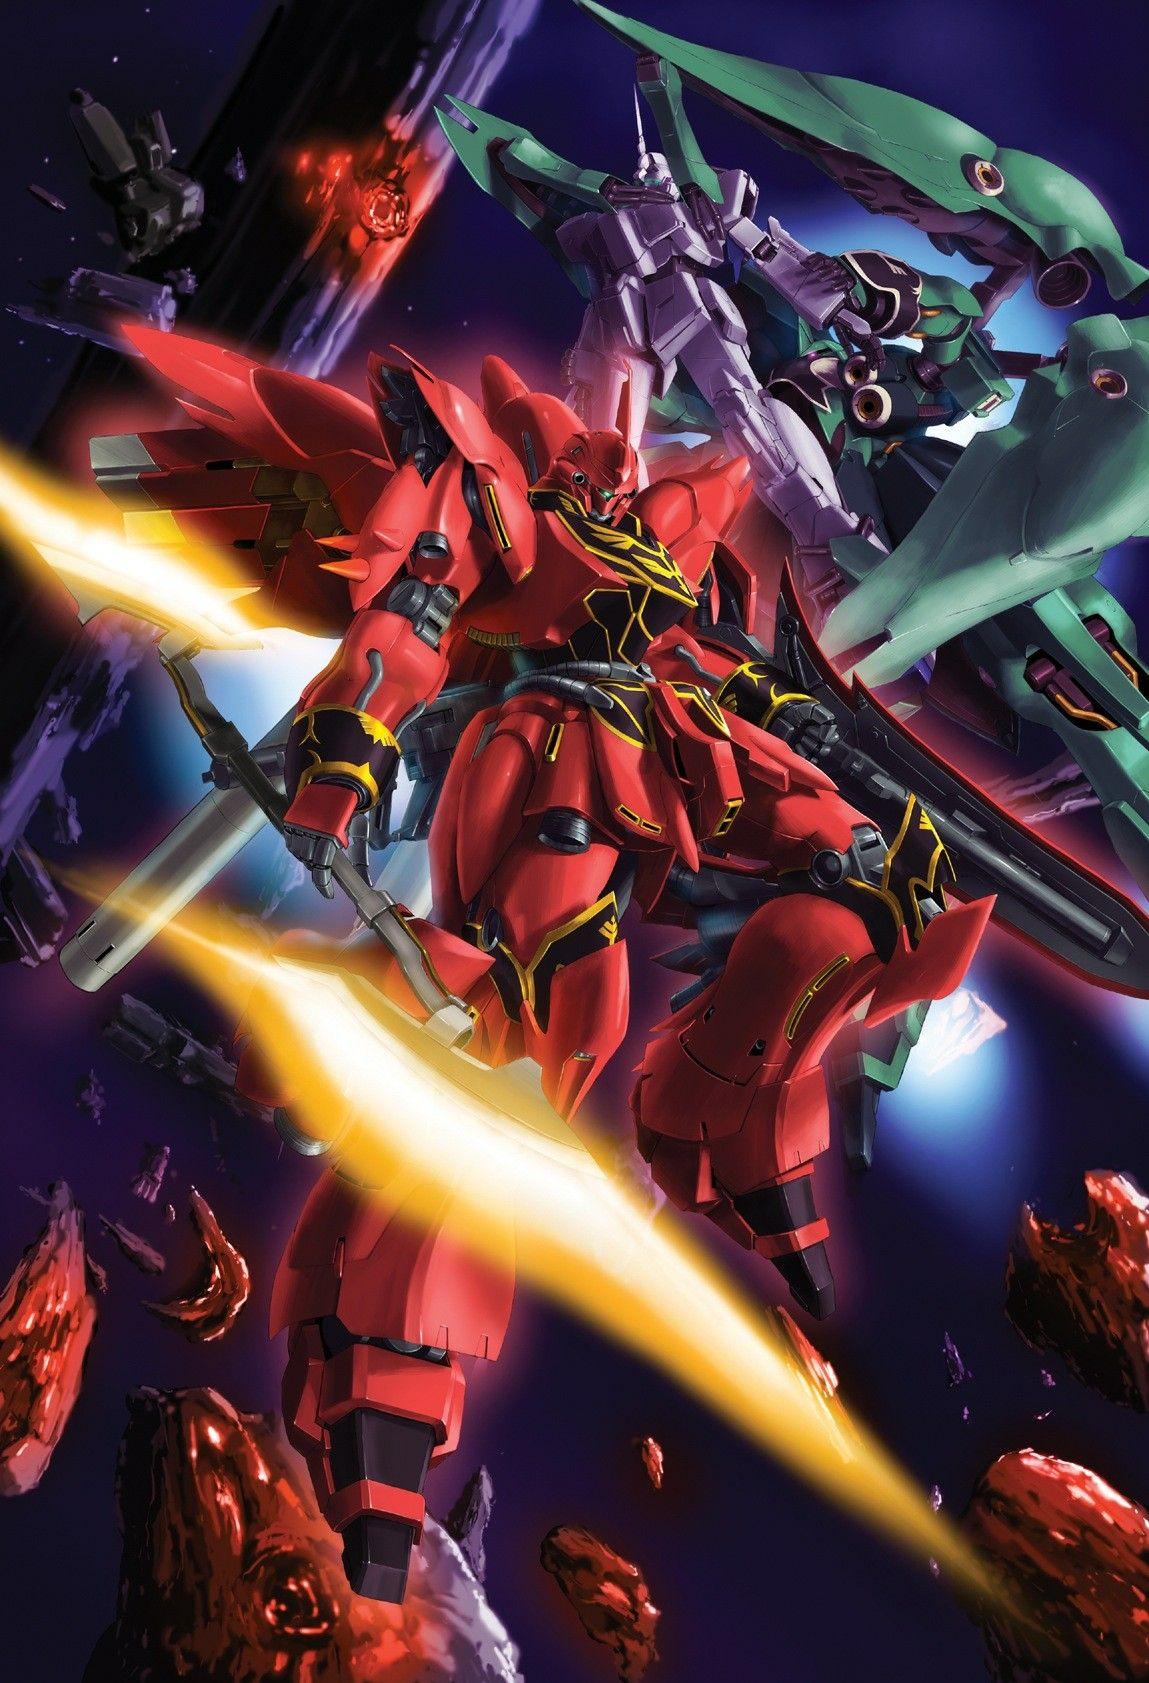 Pin by Mike on Gundam Gundam, Gundam art, Mobile suit